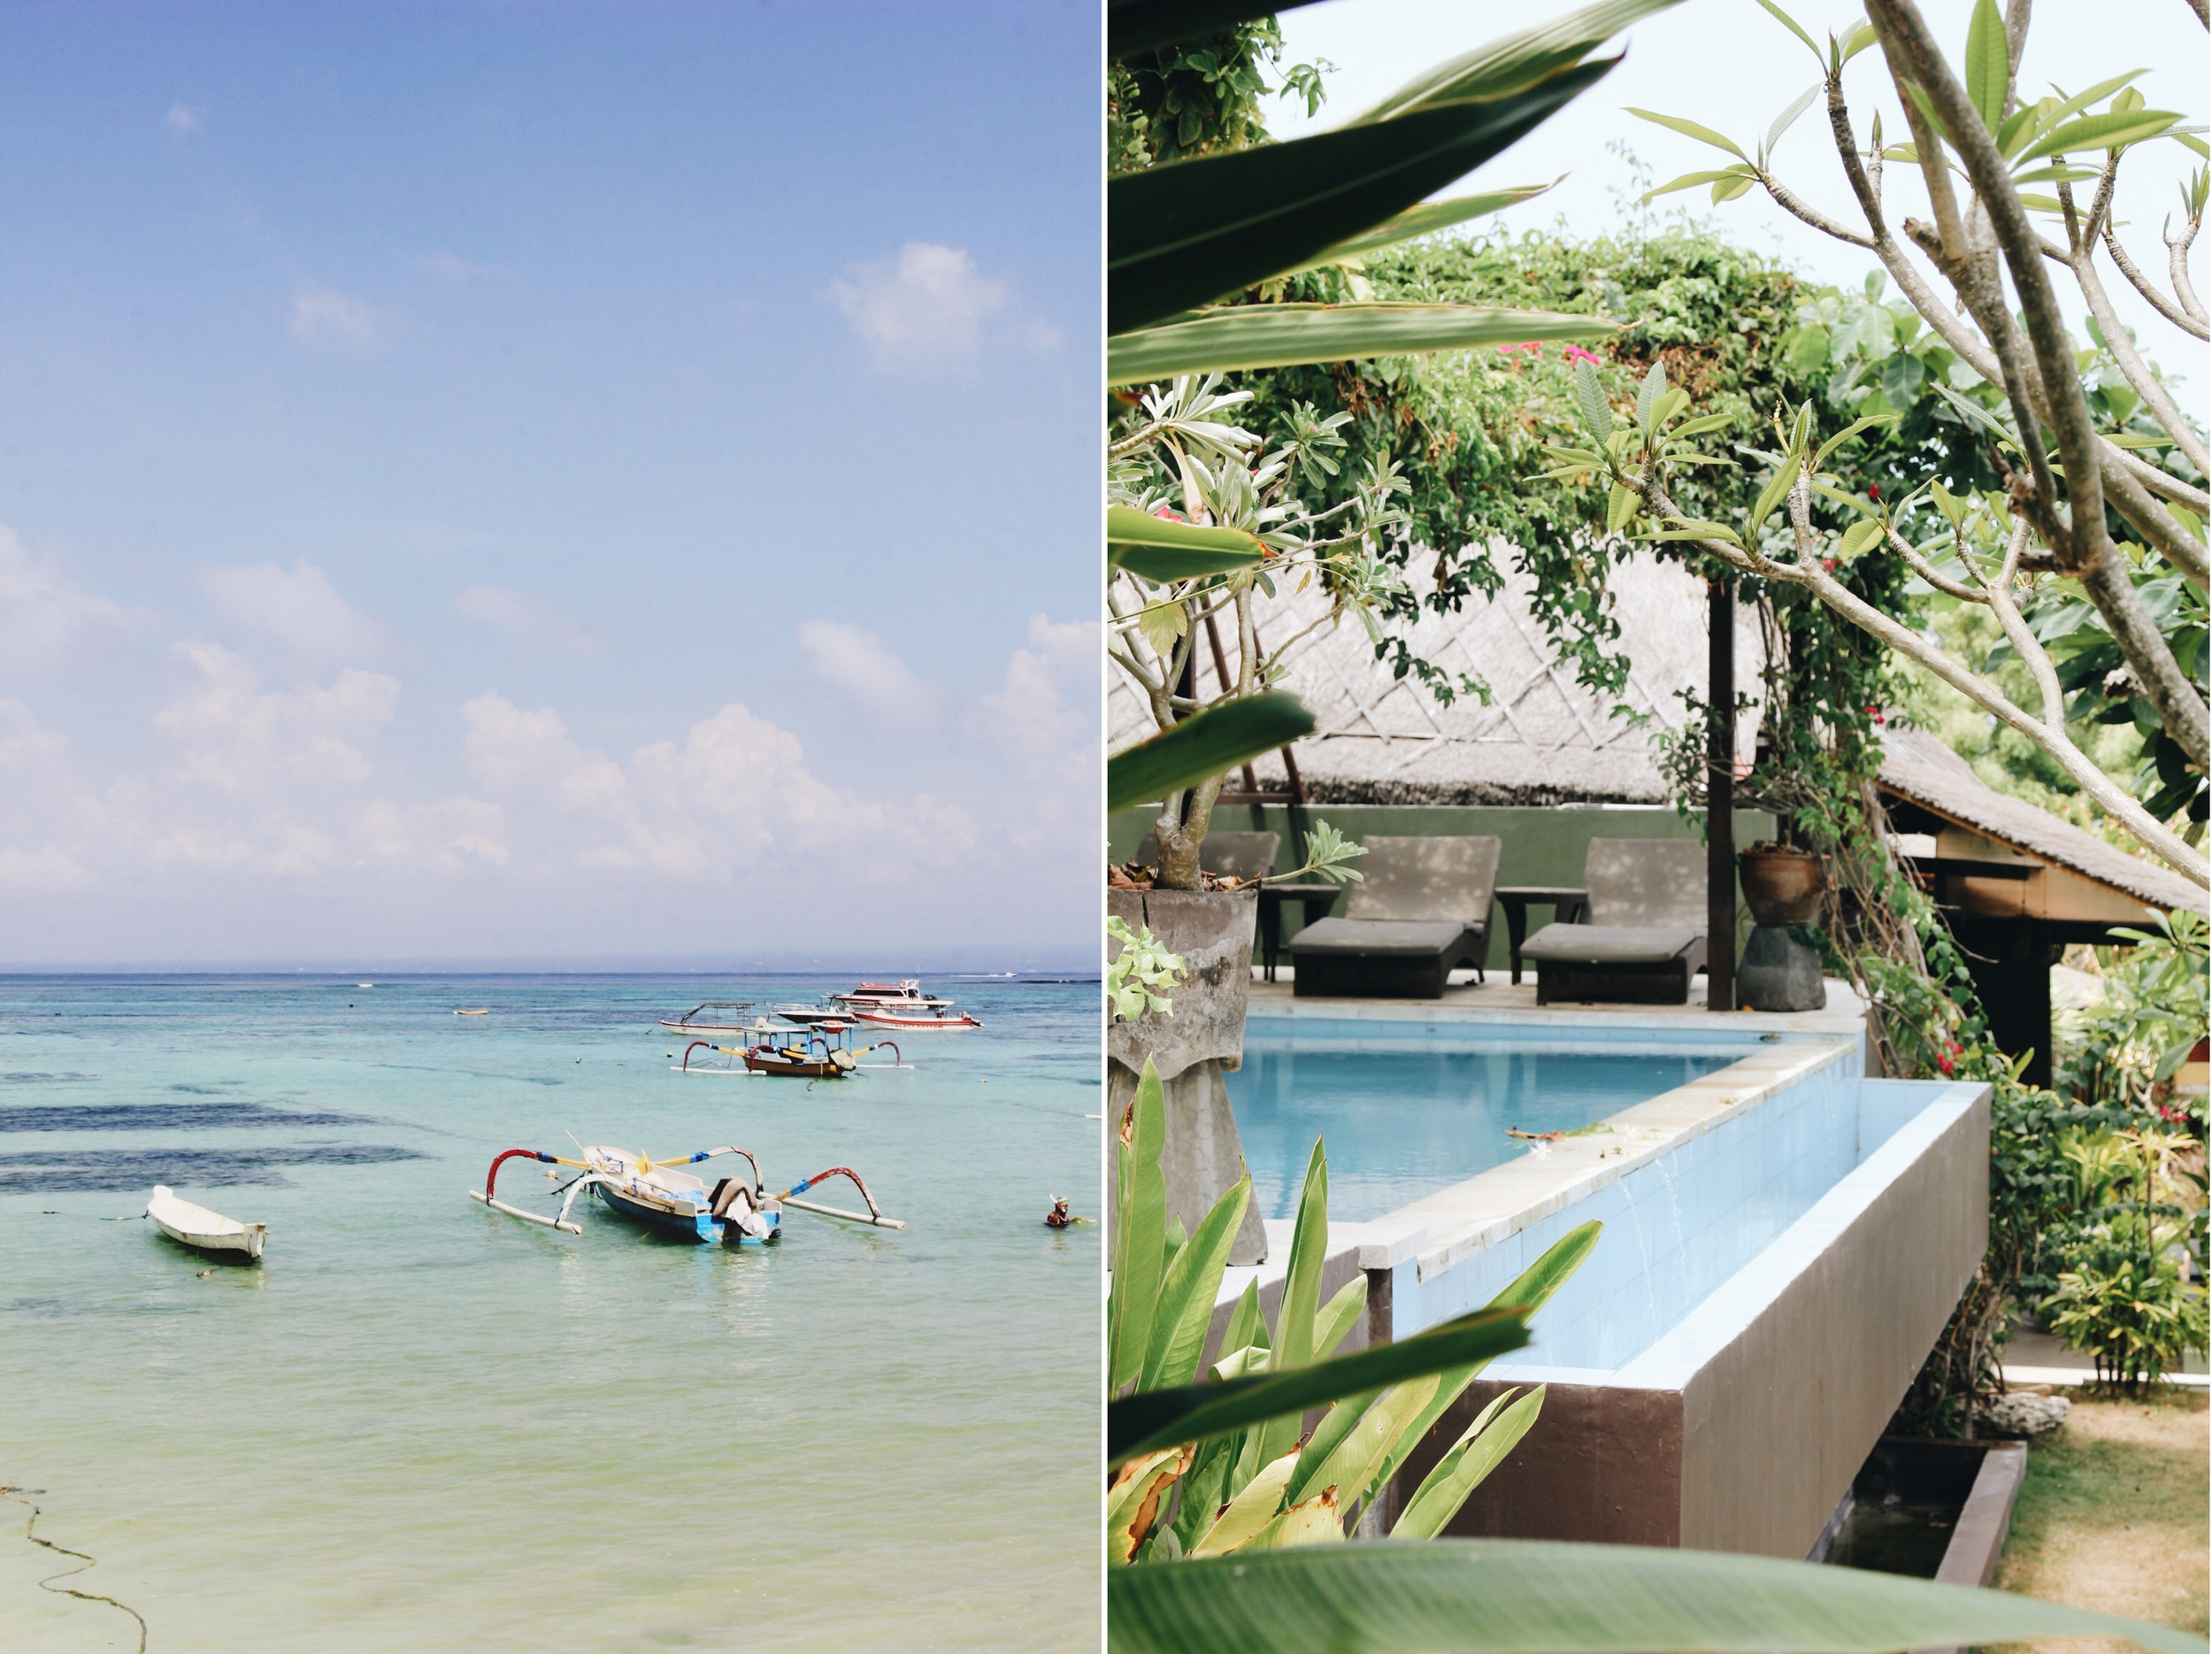 Pandana-guest-house-Bali-onmyway-nusa-lembongan.JPG